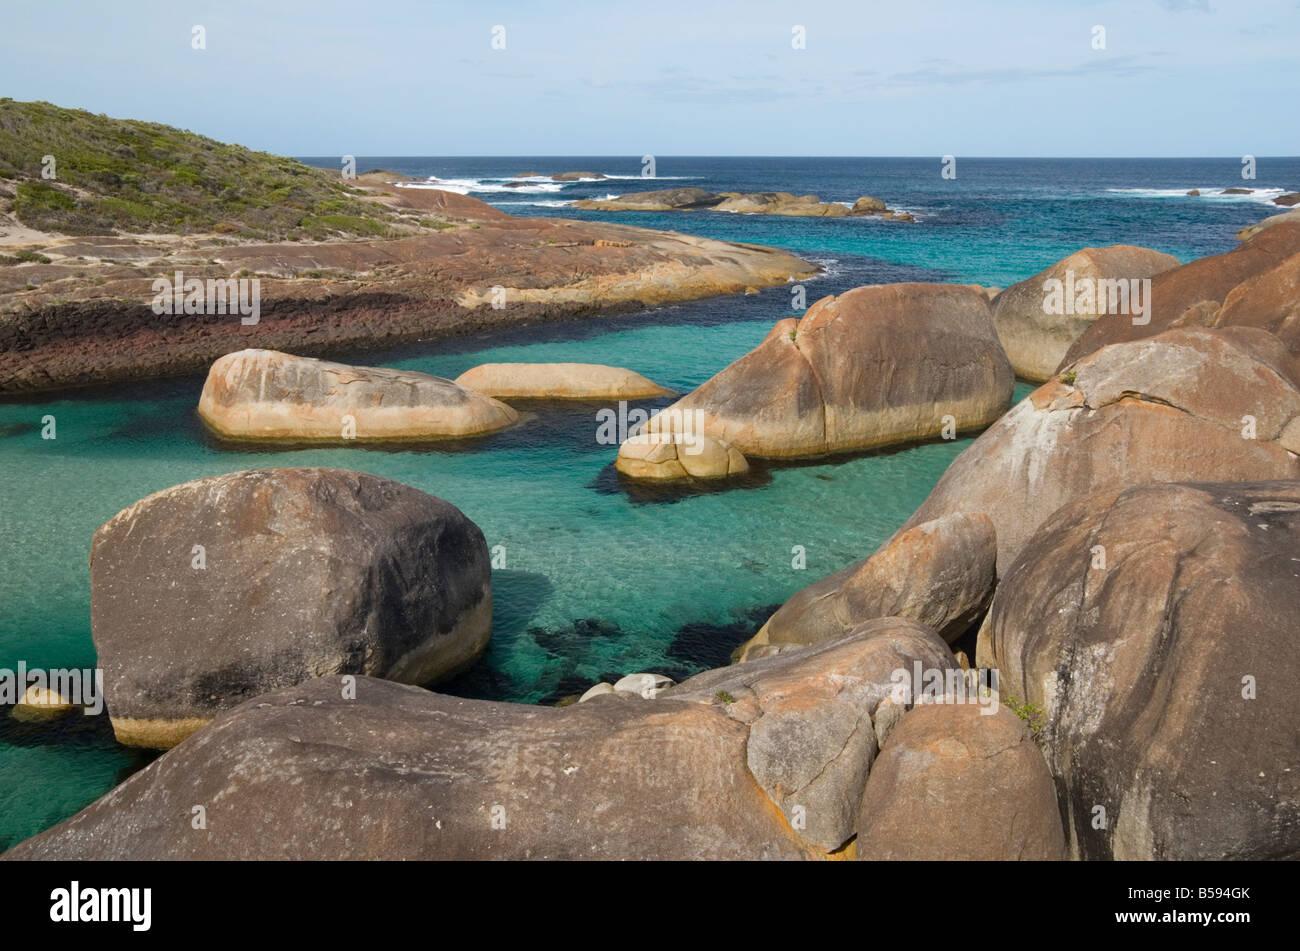 Elephant Rocks in Elephant Cove, William Bay, Western Australia - Stock Image